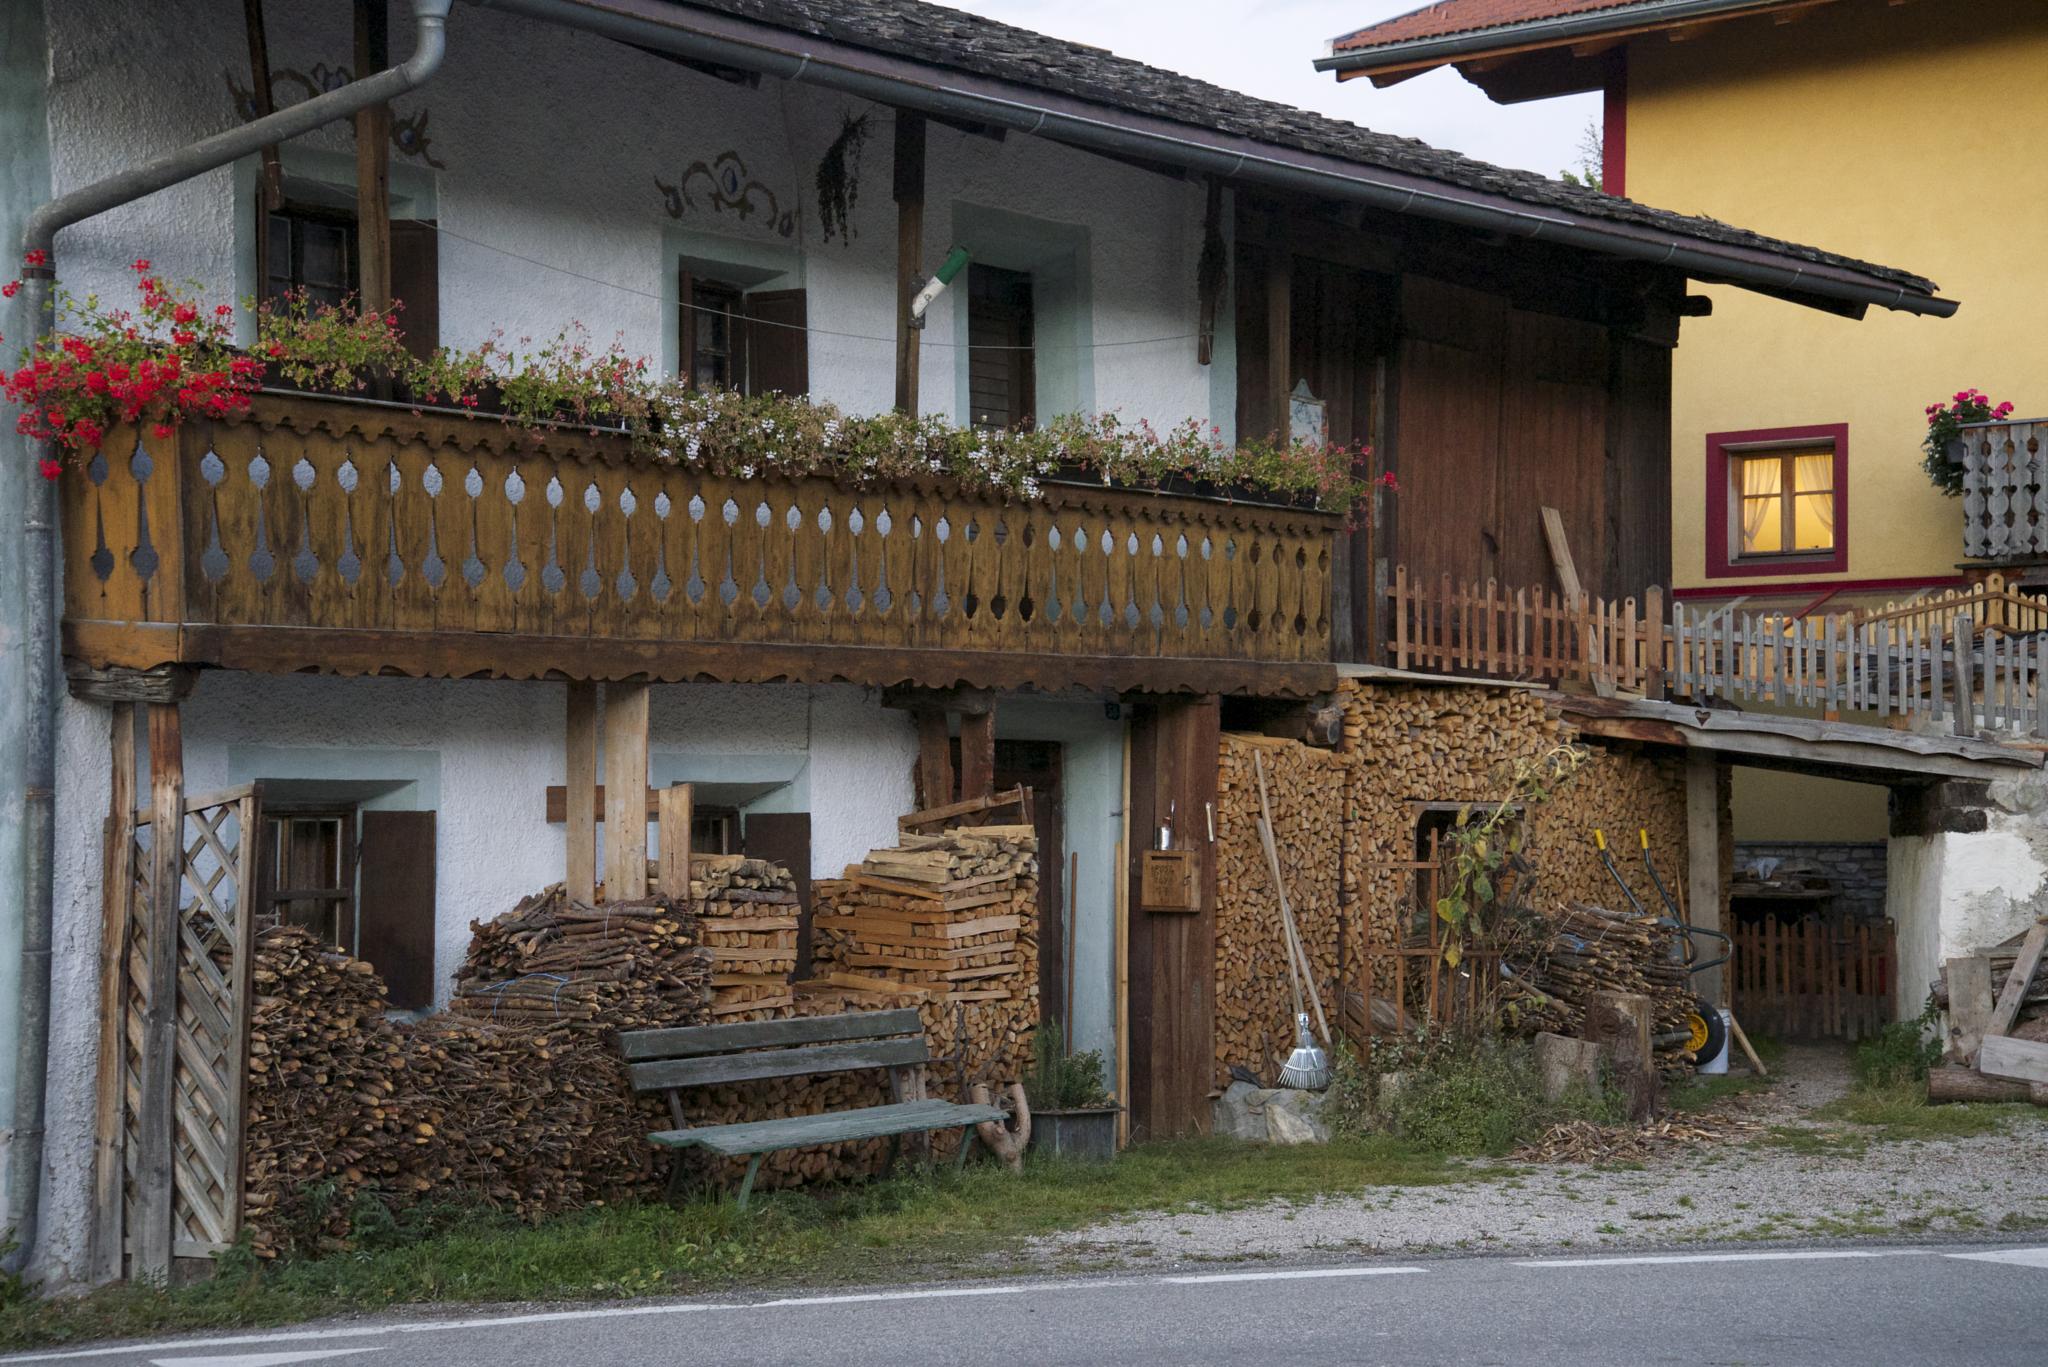 Raccolta di legna by Umberto Fontana